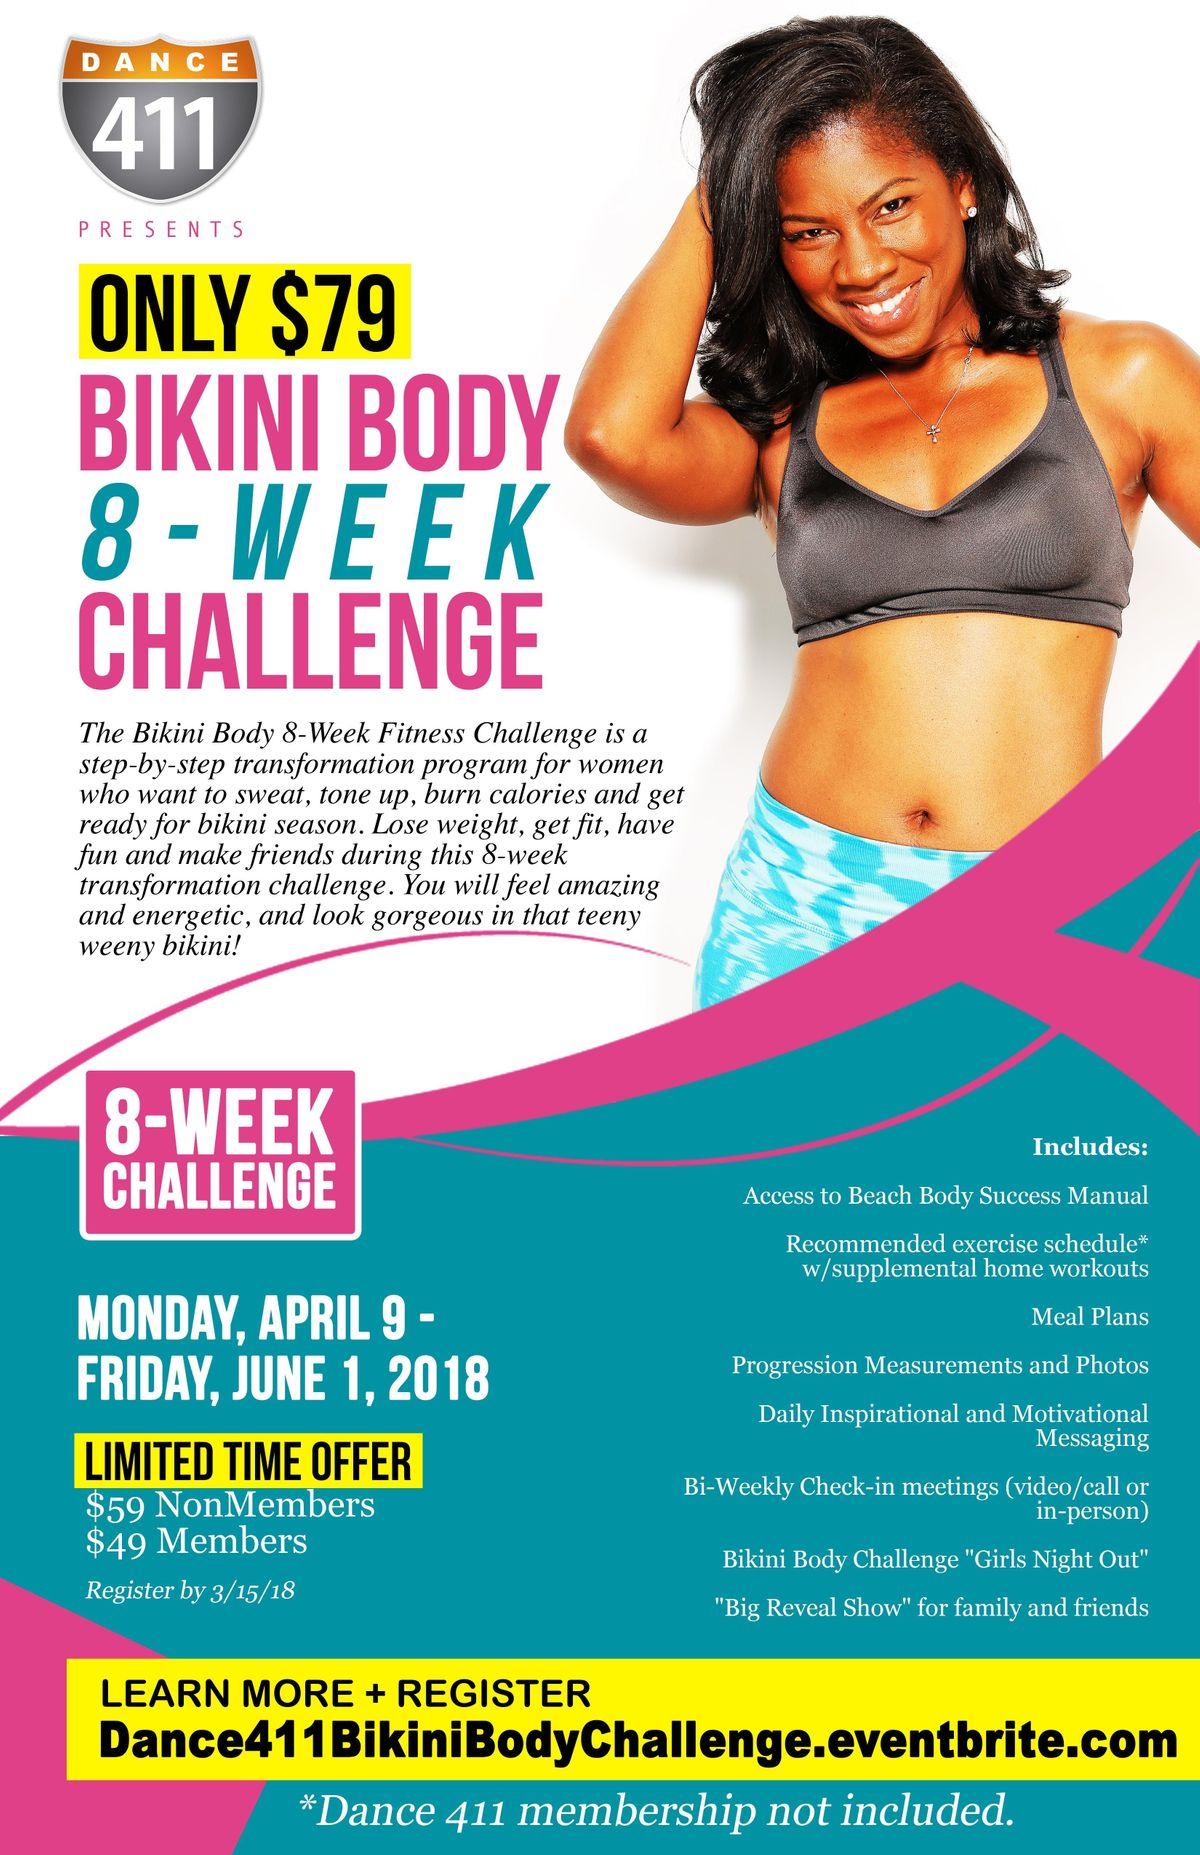 Dance 411 Adult Bikini Body 8-Week Fitness Challenge 2019